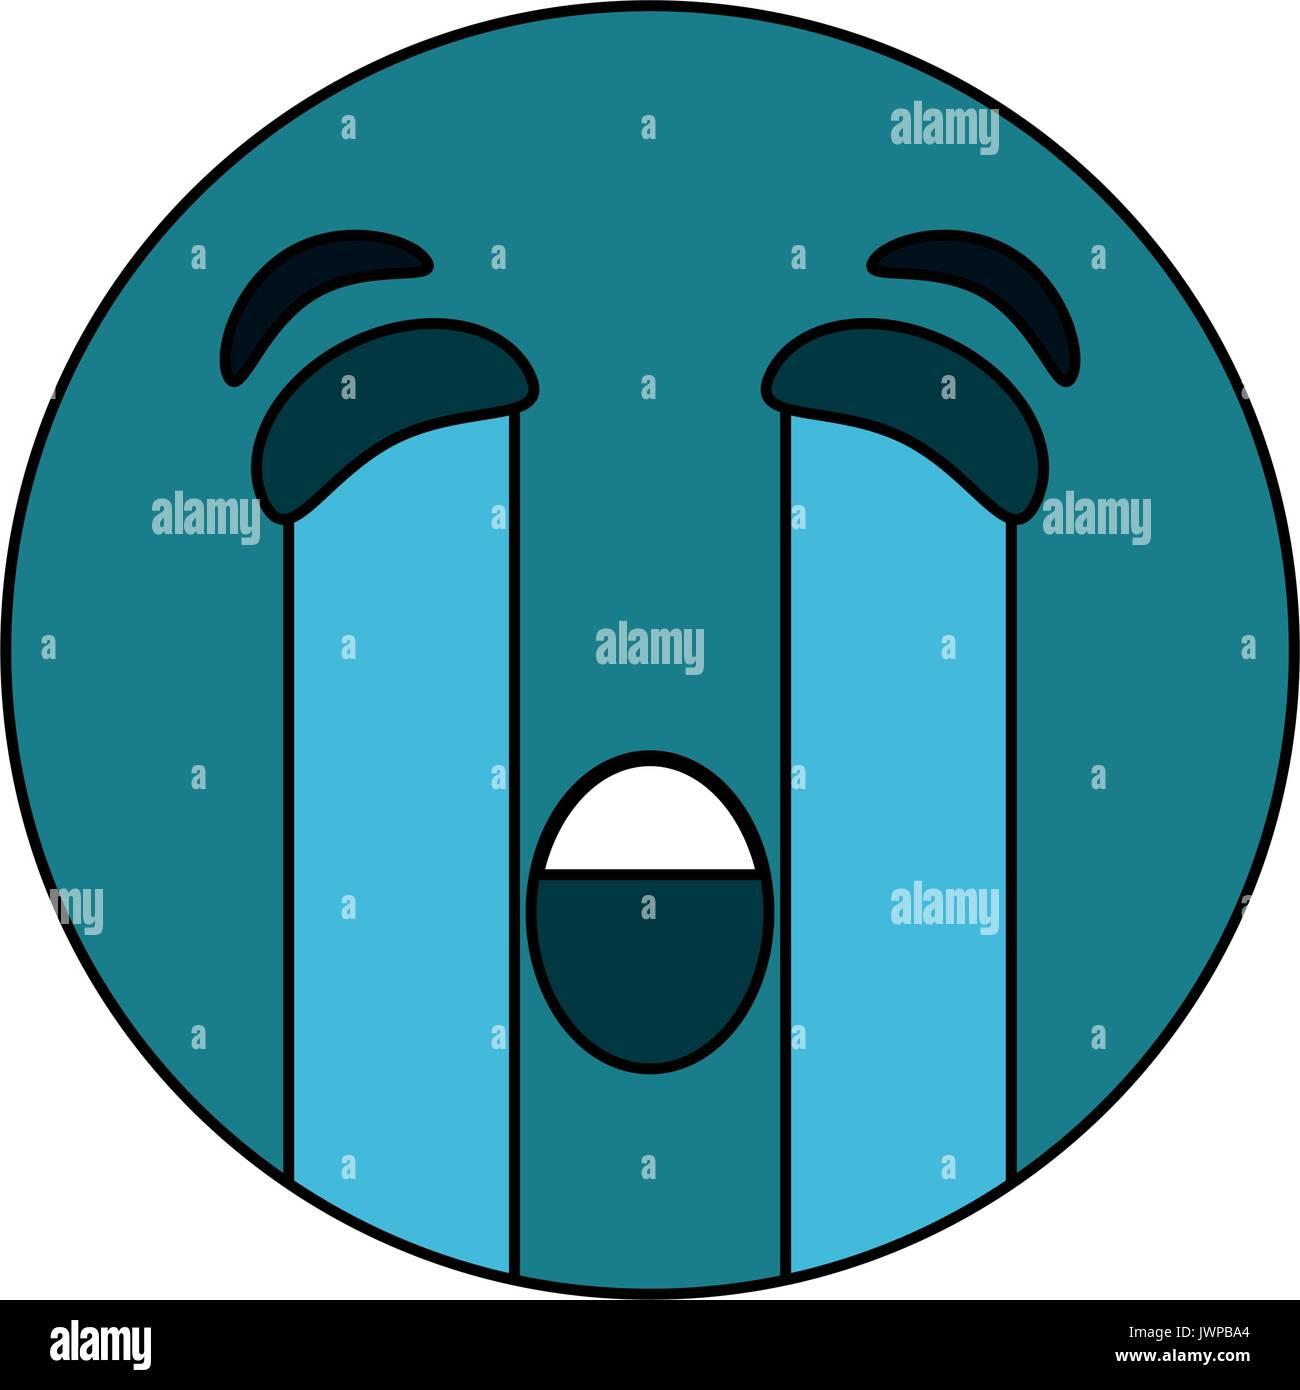 emoji icon image  - Stock Image